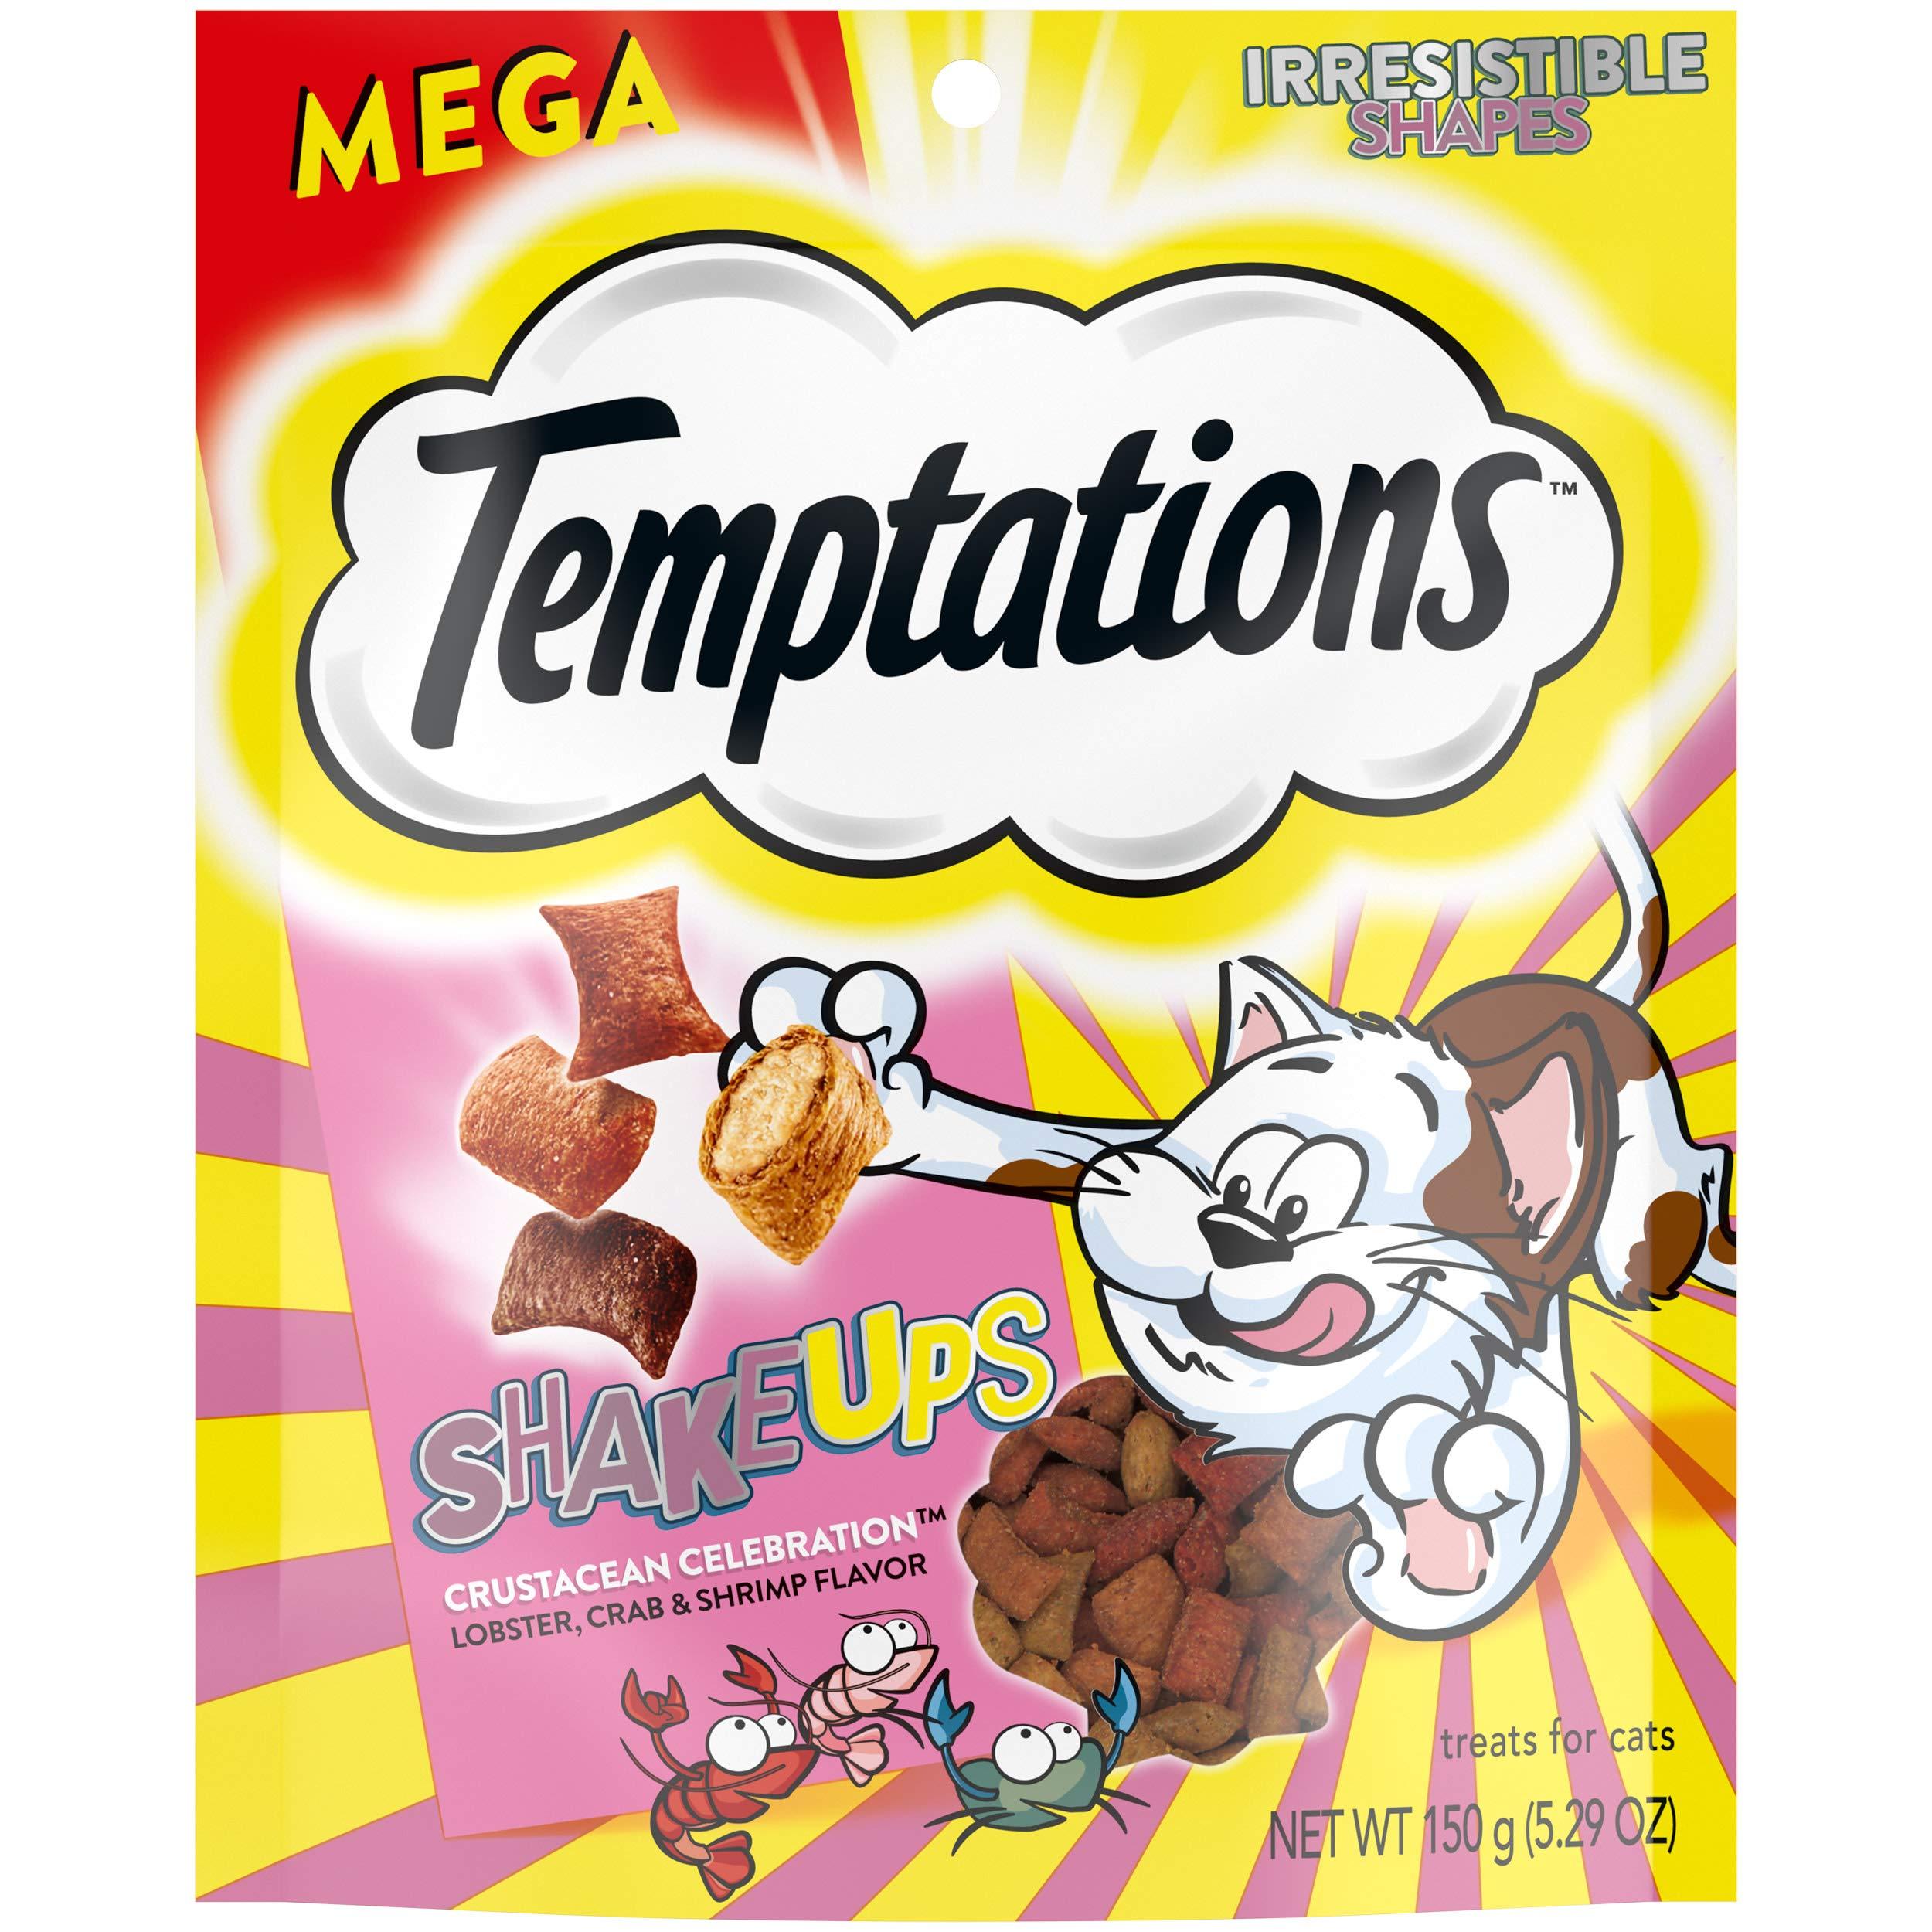 TEMPTATIONS MixUps & Shake Ups Crunchy and Soft Cat Treats, 5 - 6.3 oz.